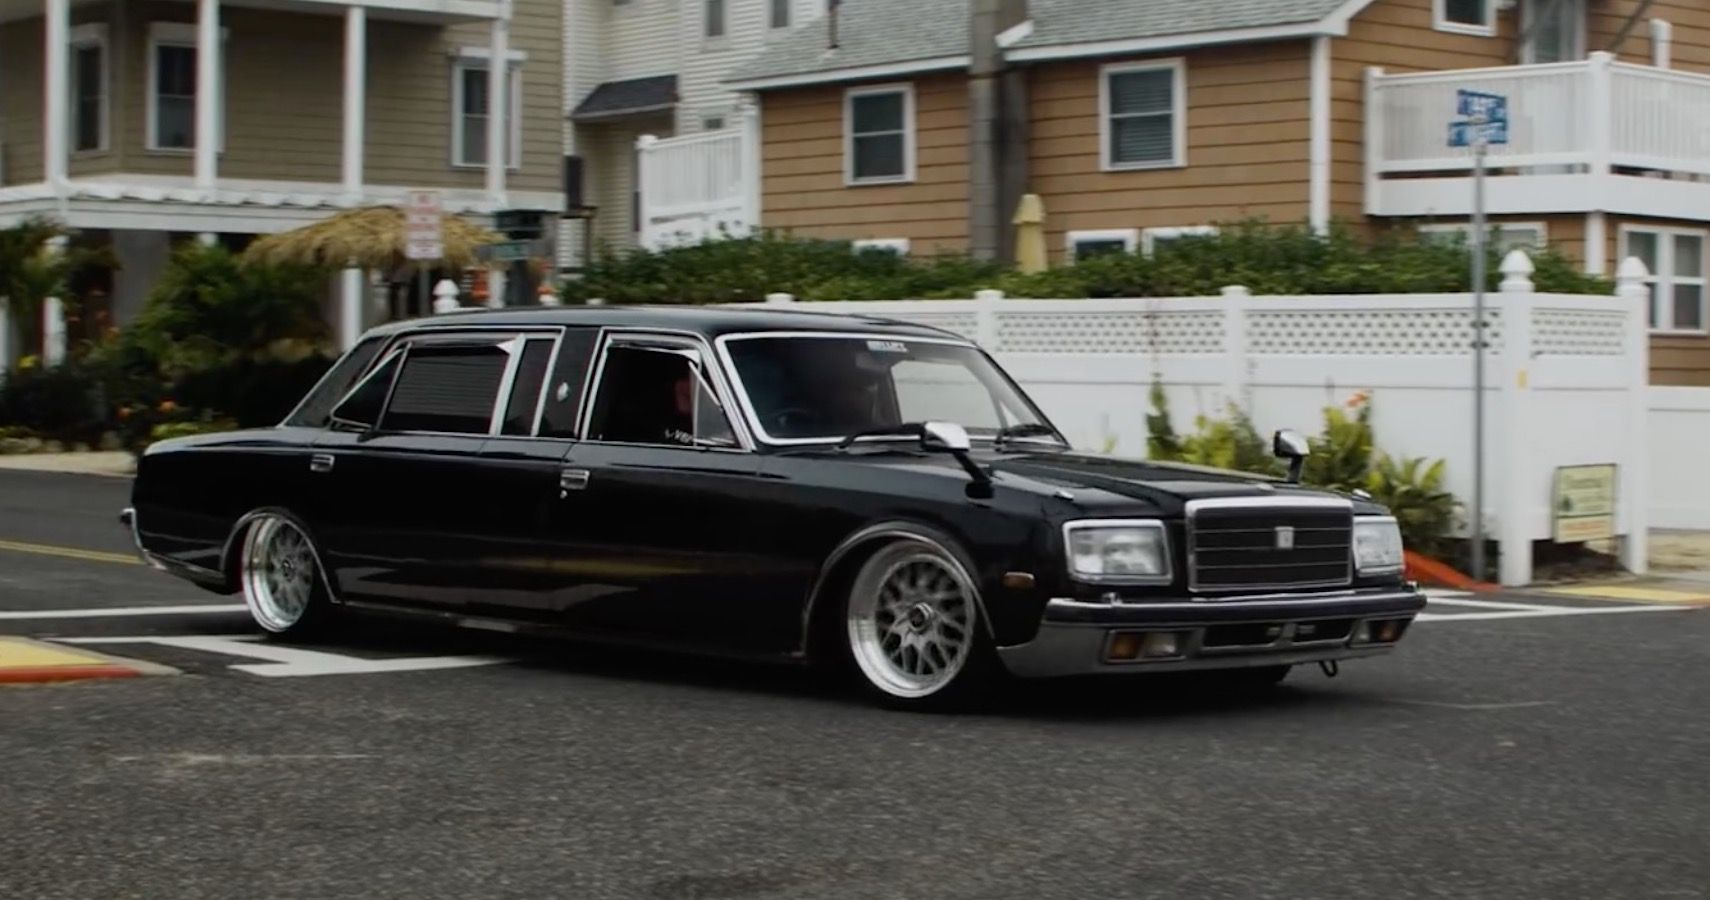 This Rare Toyota Century Lowrider Is A Mafia Gangster's Dream Ride